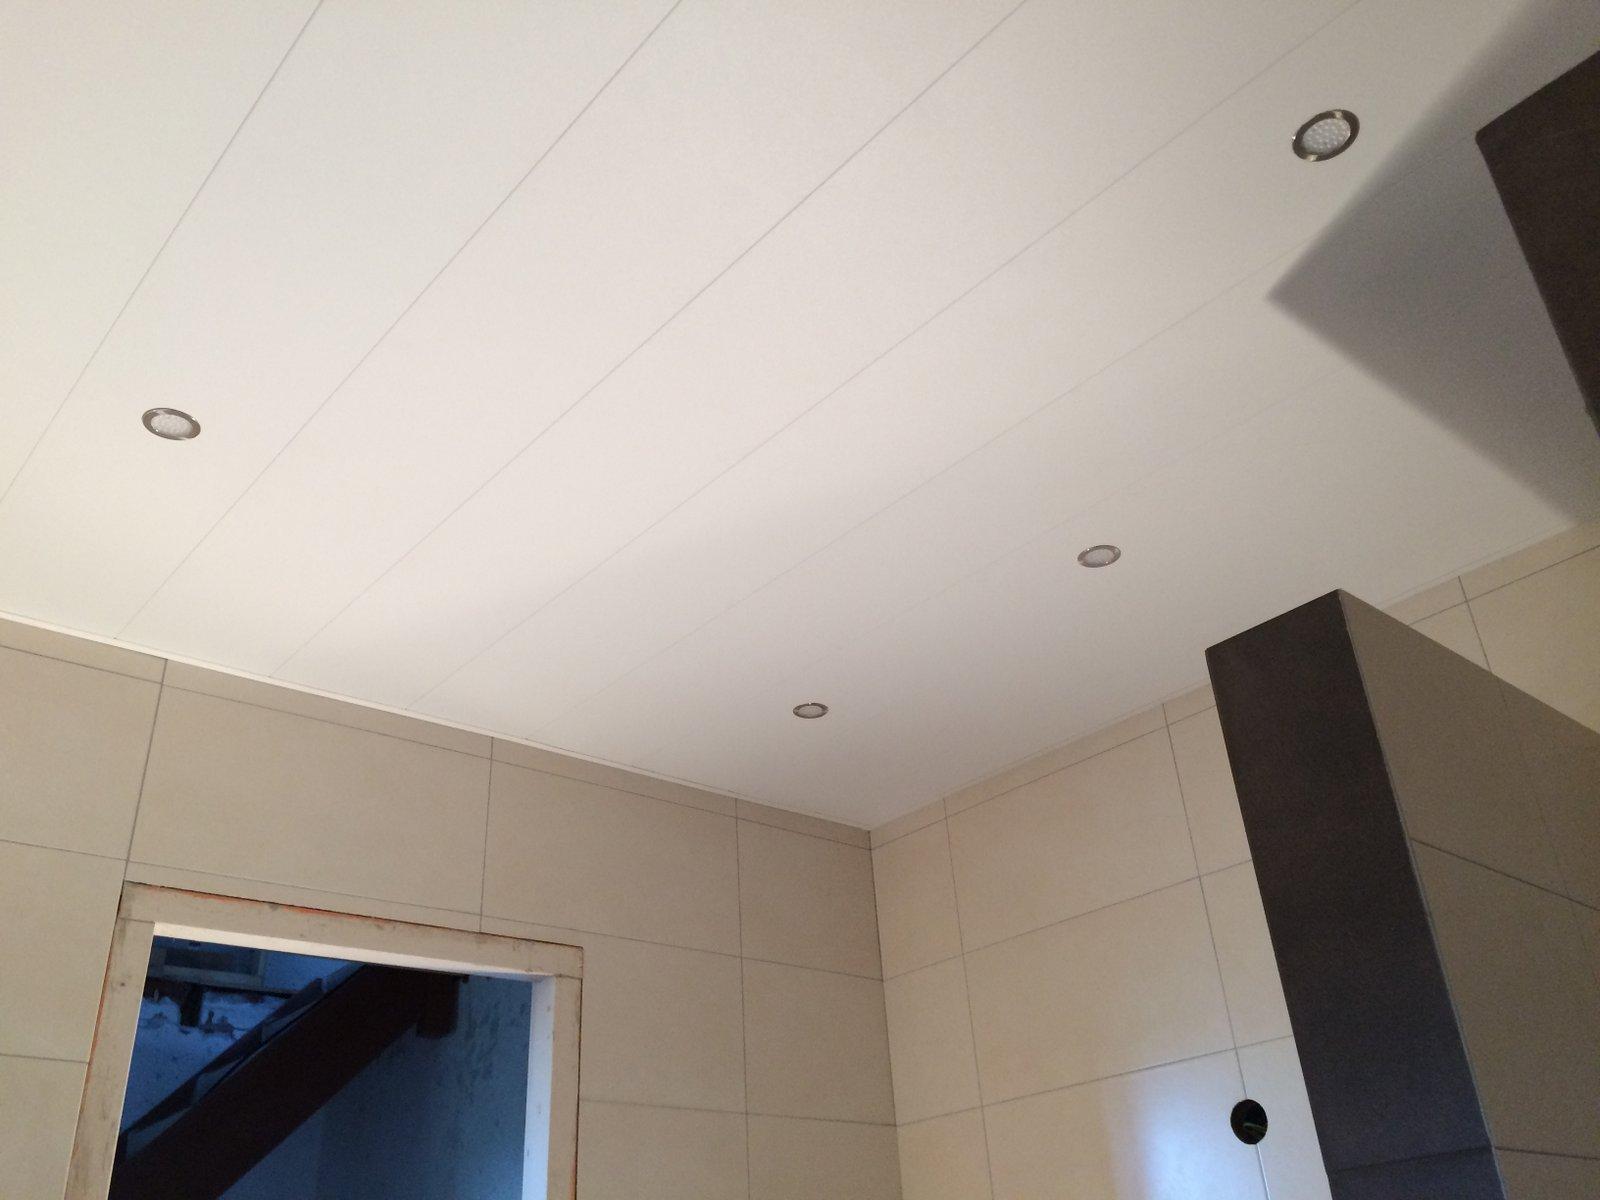 A2 Maatwerk Plafond / Vloeren / Wanden